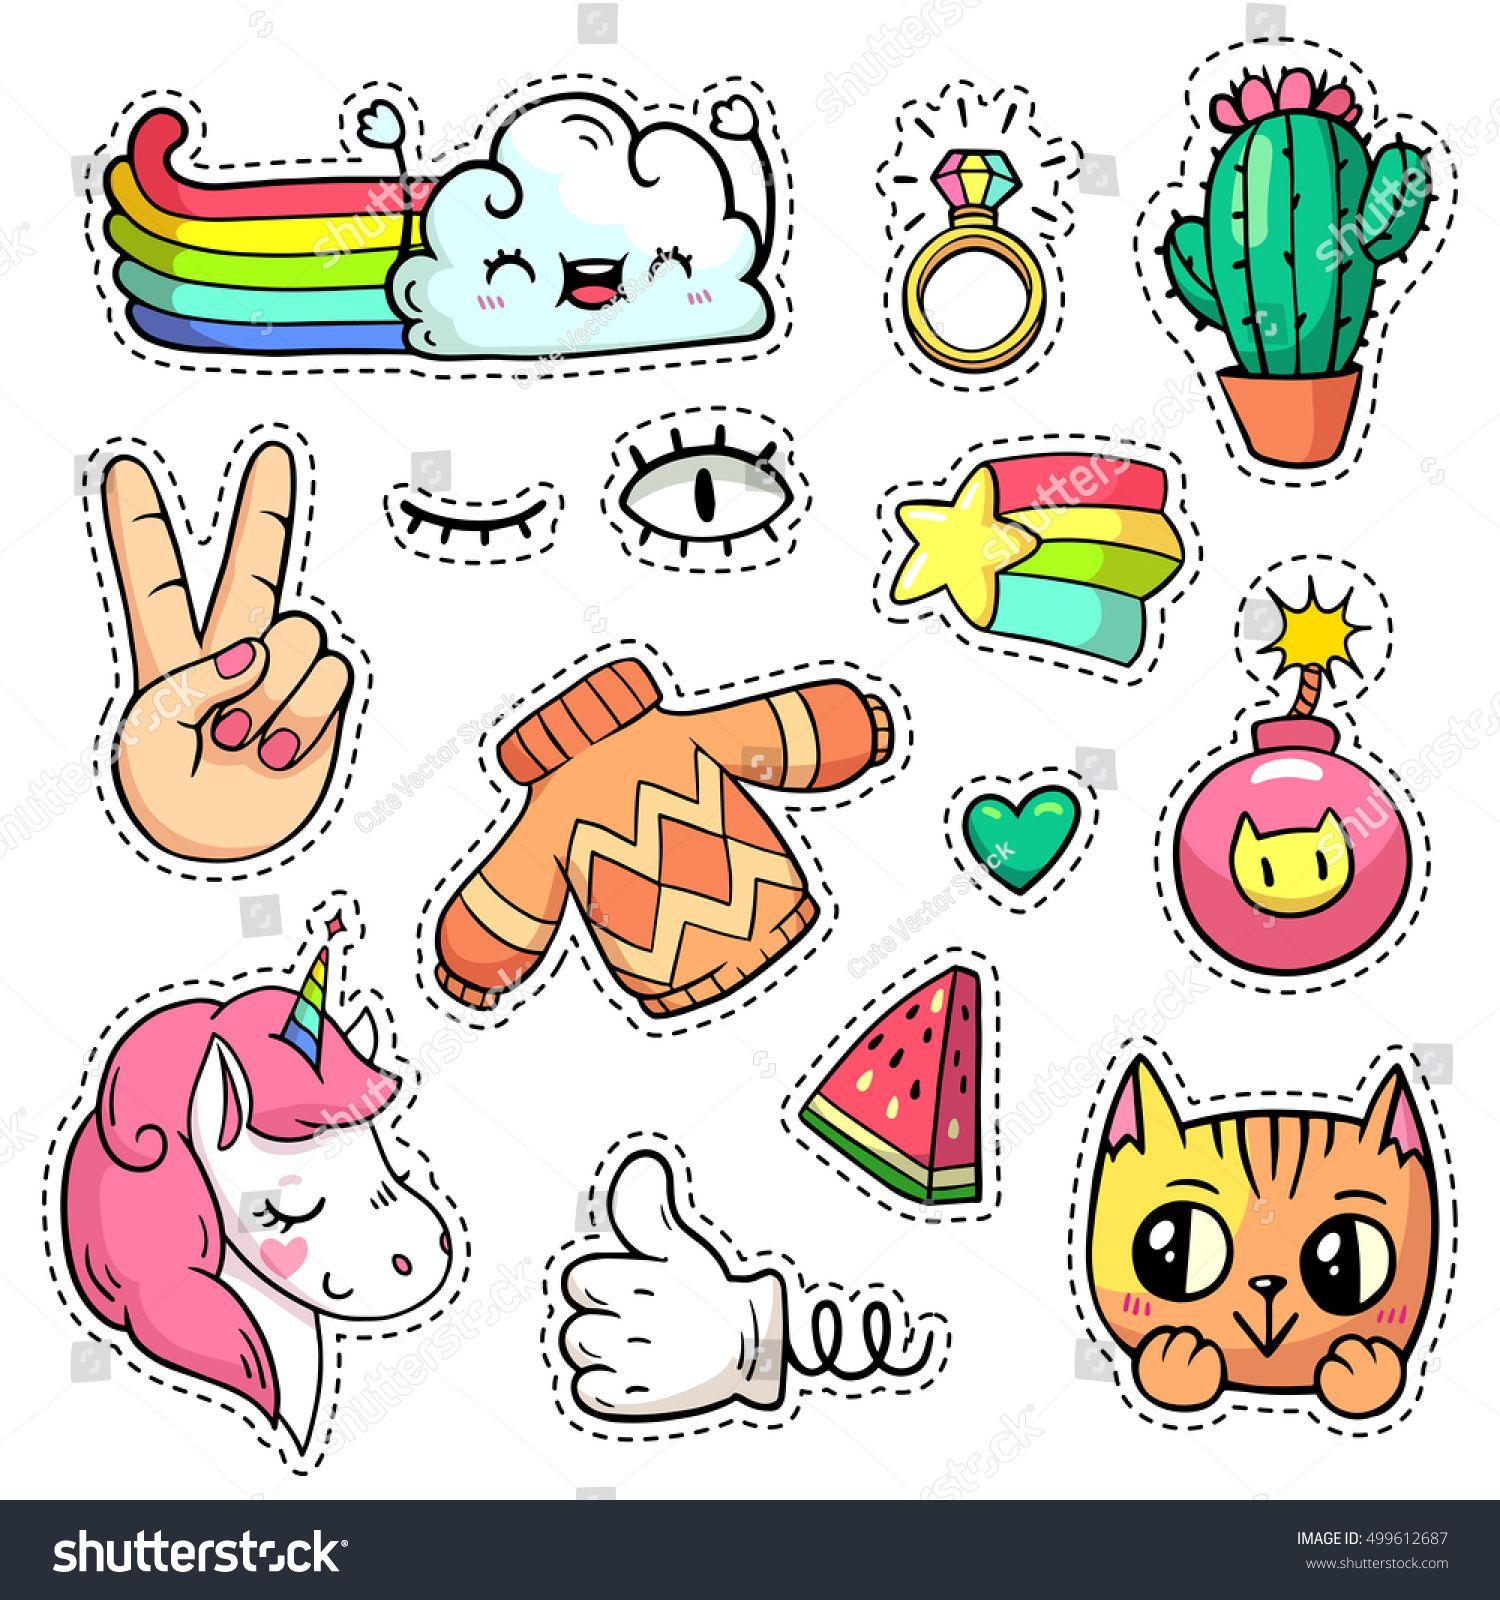 imagens de sorvetes kawaii para colorir